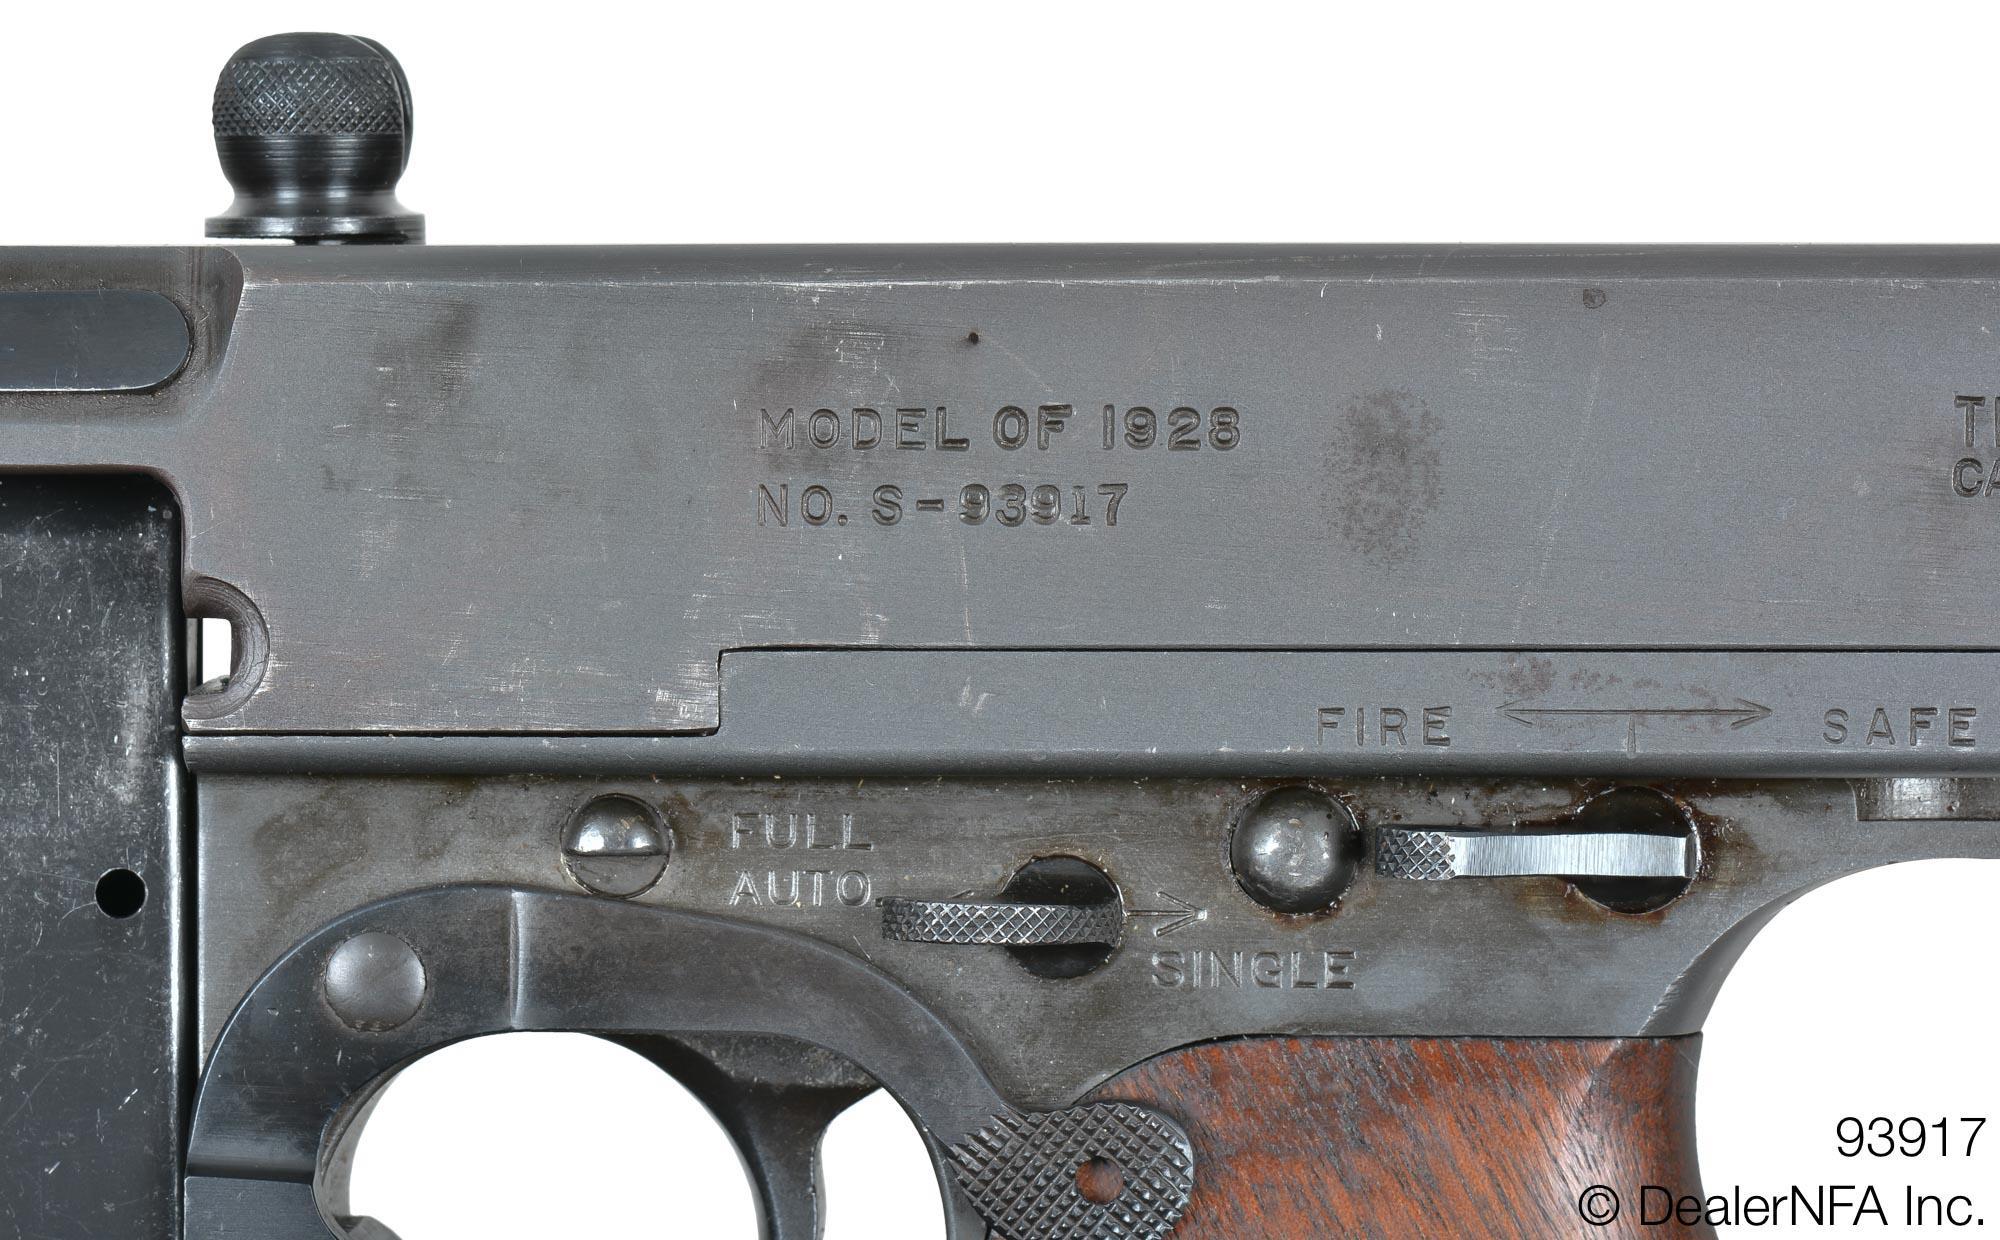 Savage, 1928, Early Thompson, 1941 - NFA Market Board